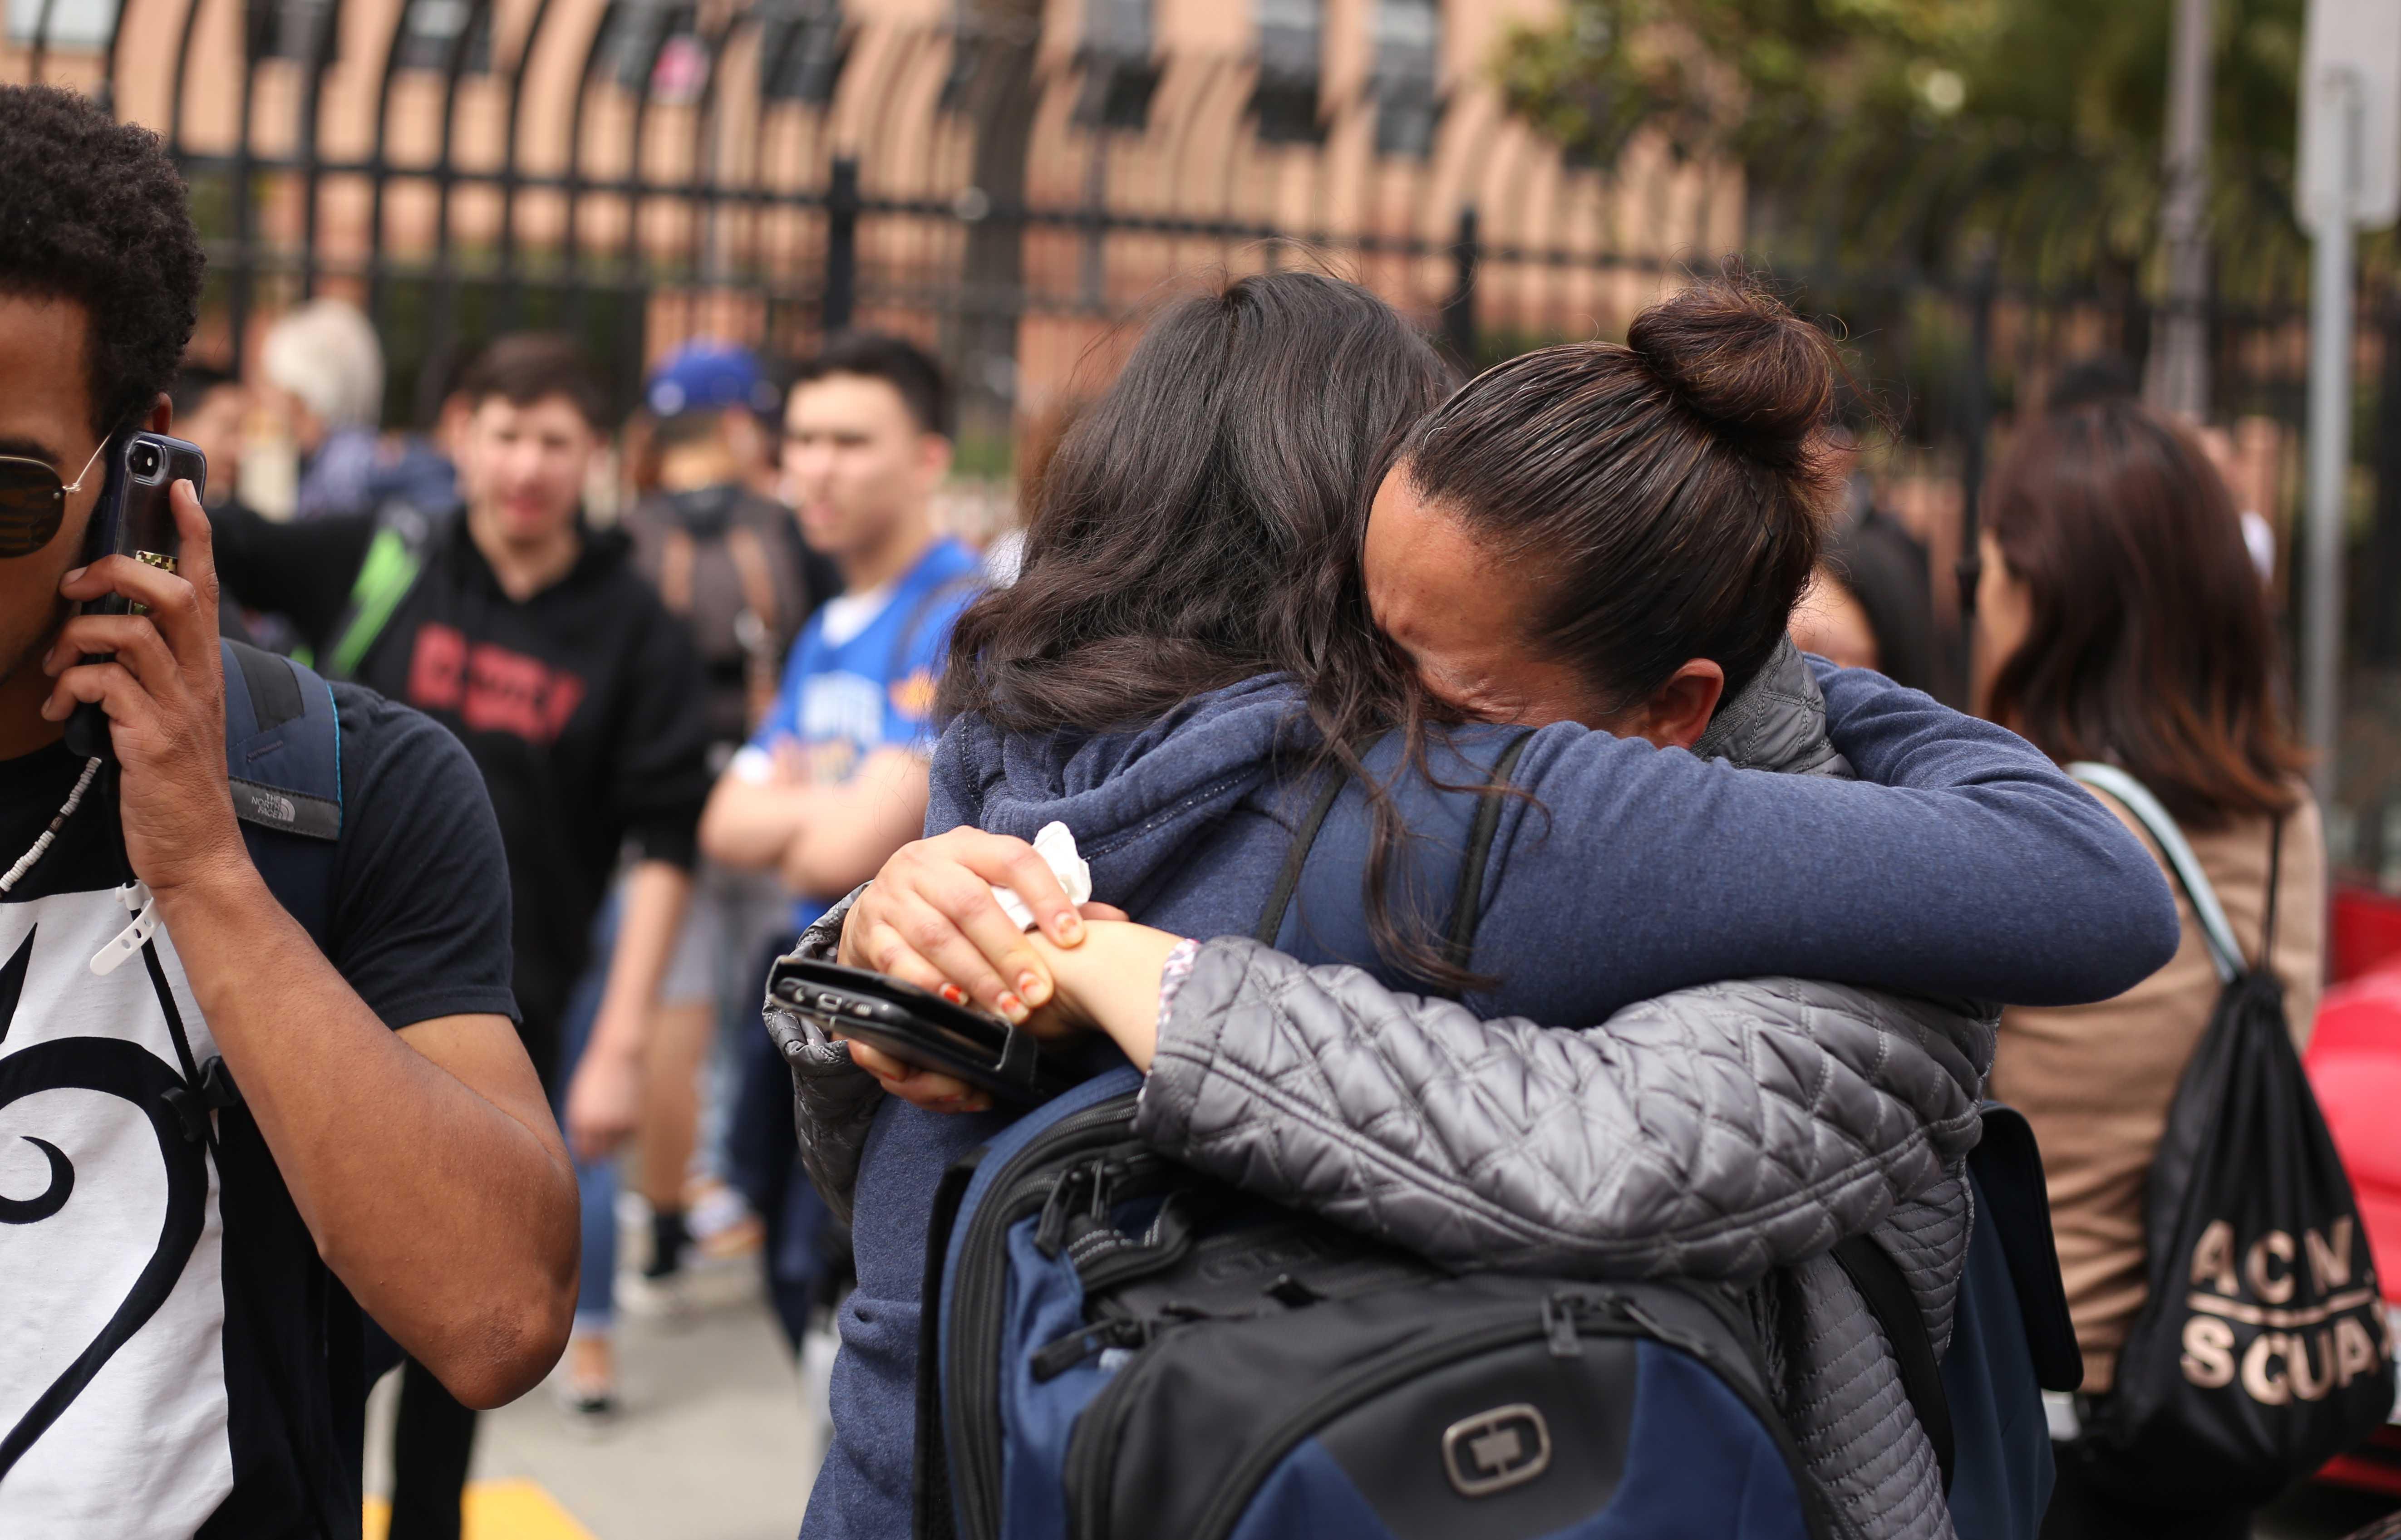 Reports of gunfire at Balboa High School lead to four school lockdowns